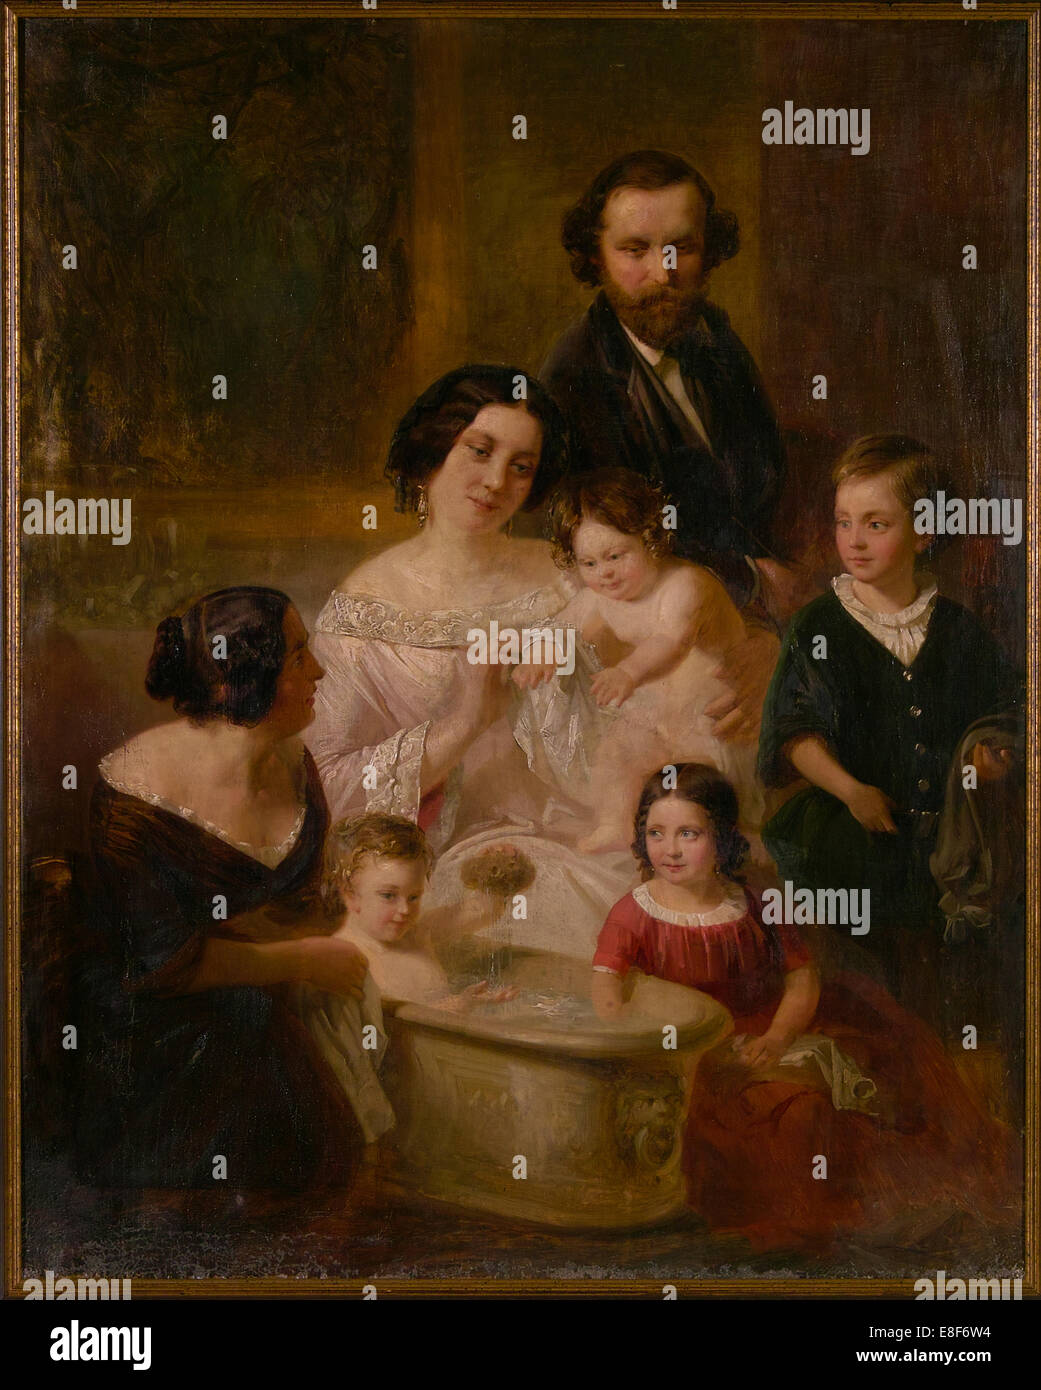 Family portrait. Artist: Wodick, Edmund (1816-1886) - Stock Image